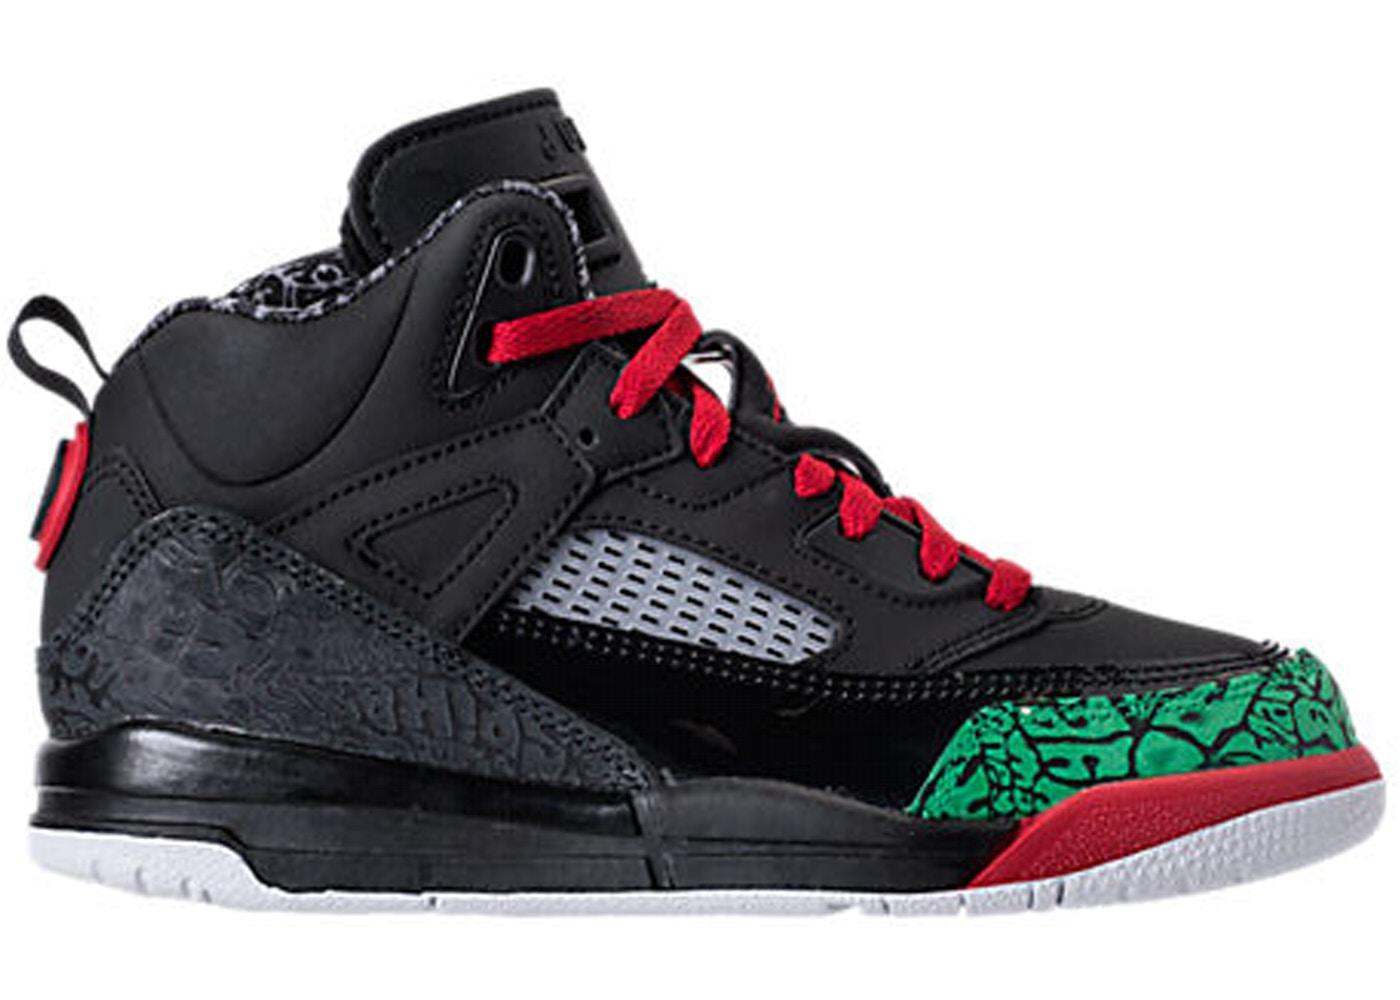 new style d58a4 1cc35 Jordan Spizike Black Varsity Red 2017 (PS)